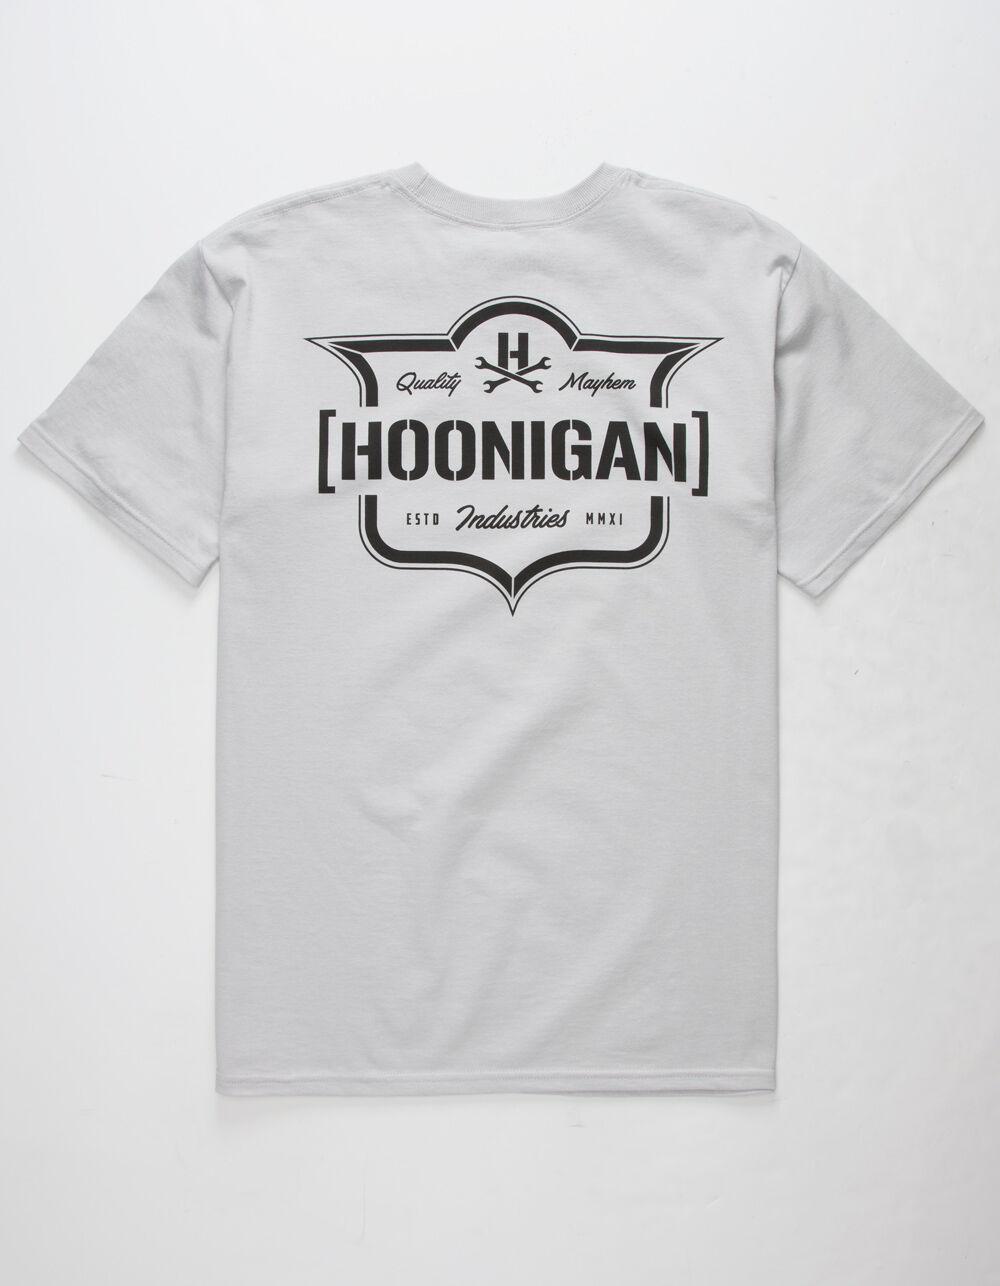 HOONIGAN Emblem T-Shirt